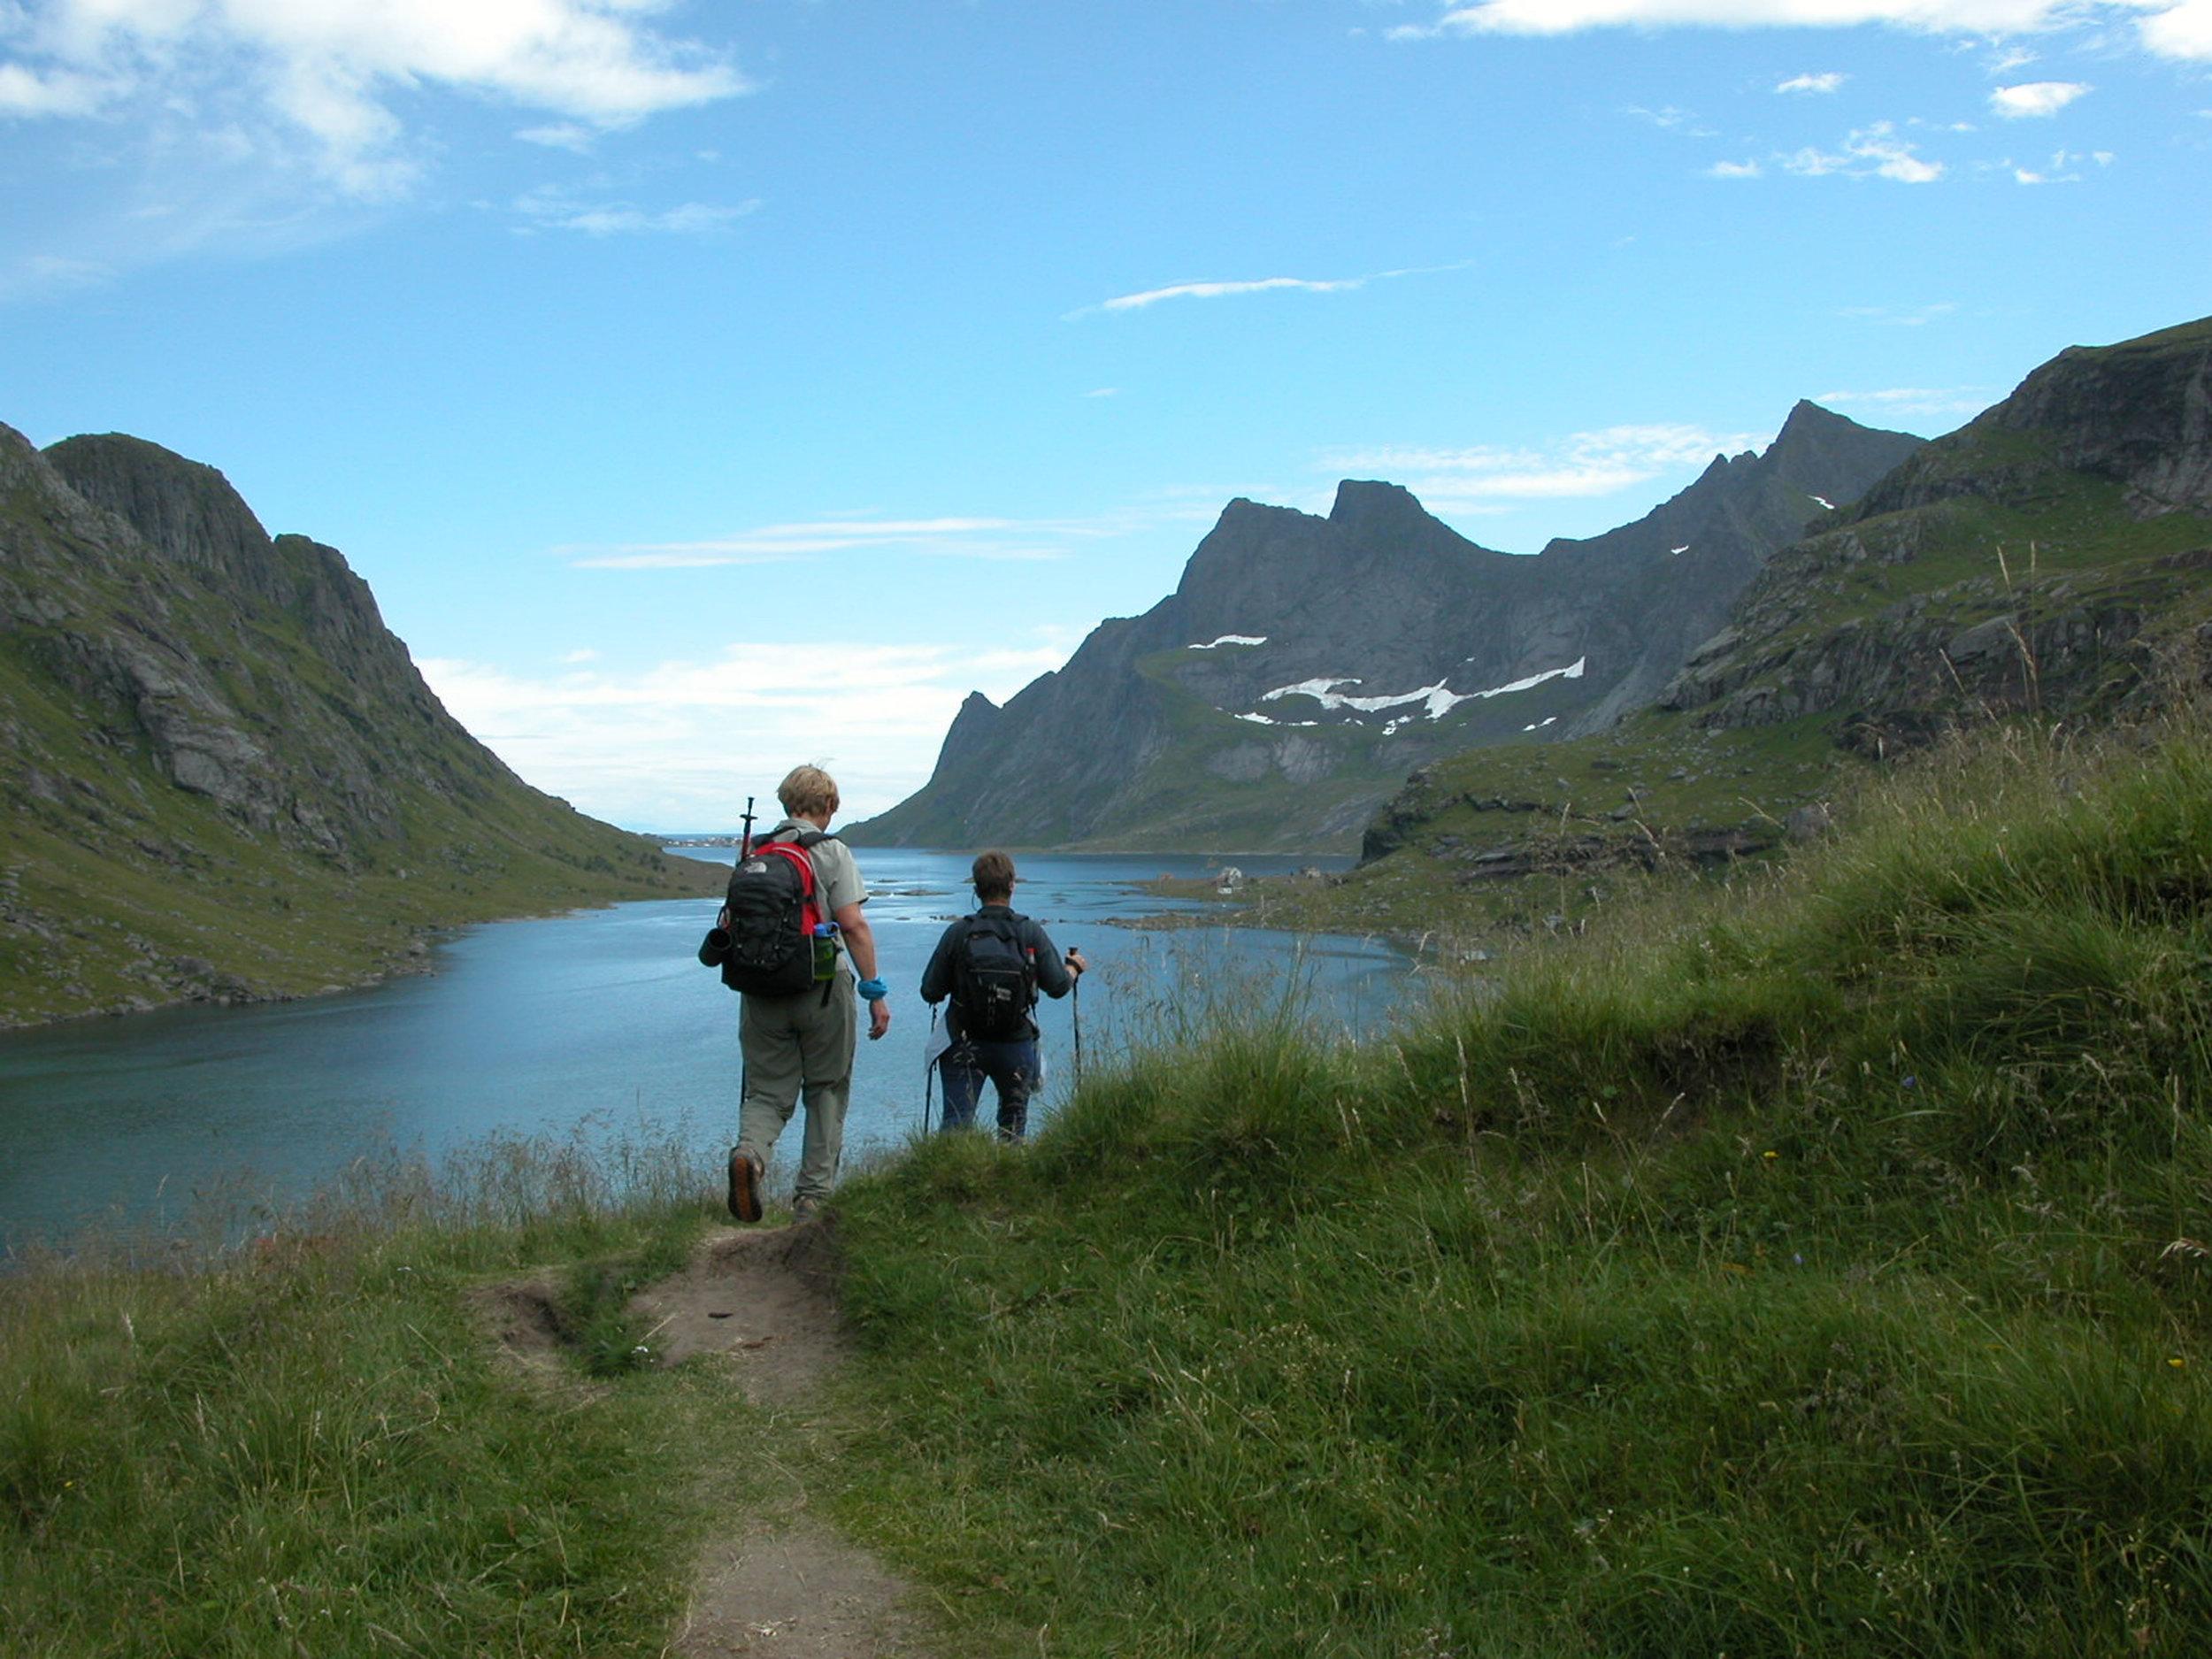 Geir Rune Holm www.nordnorge.com